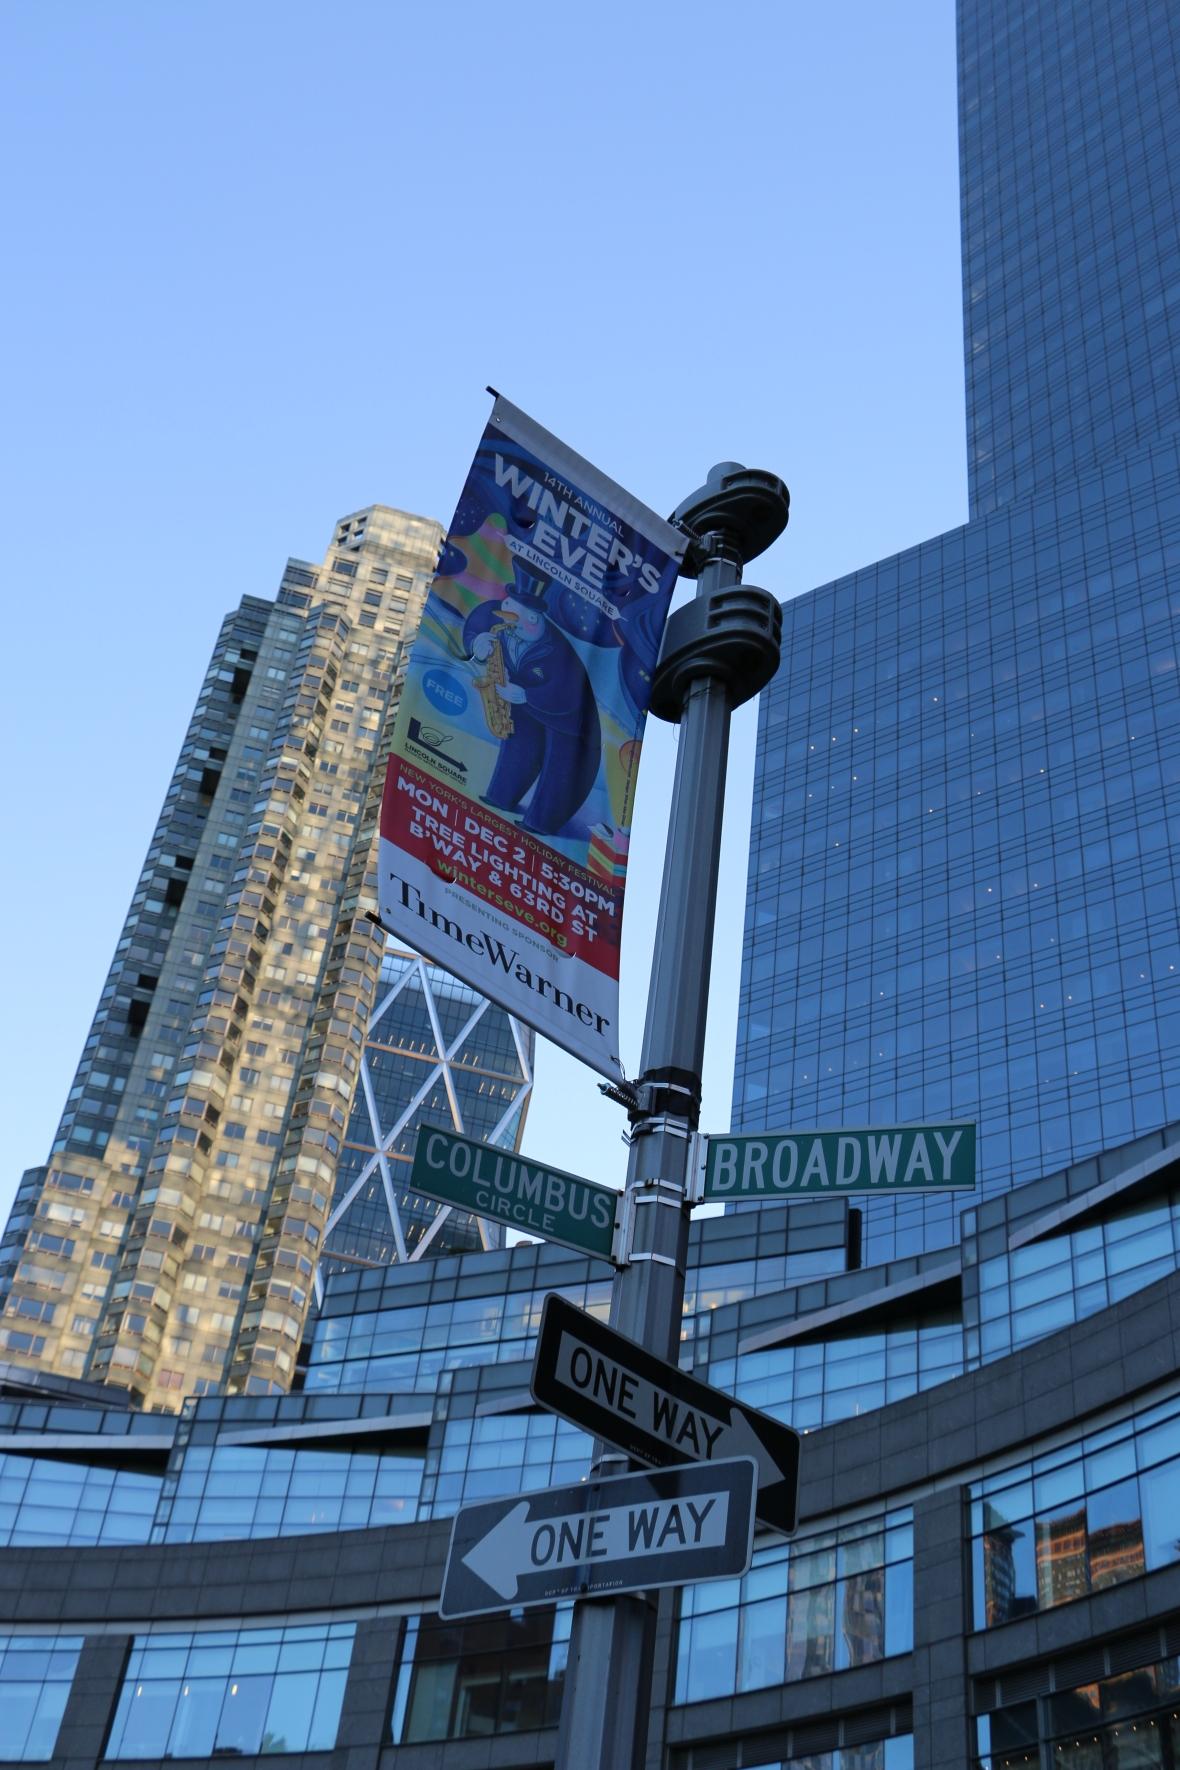 Columbus & Broadway